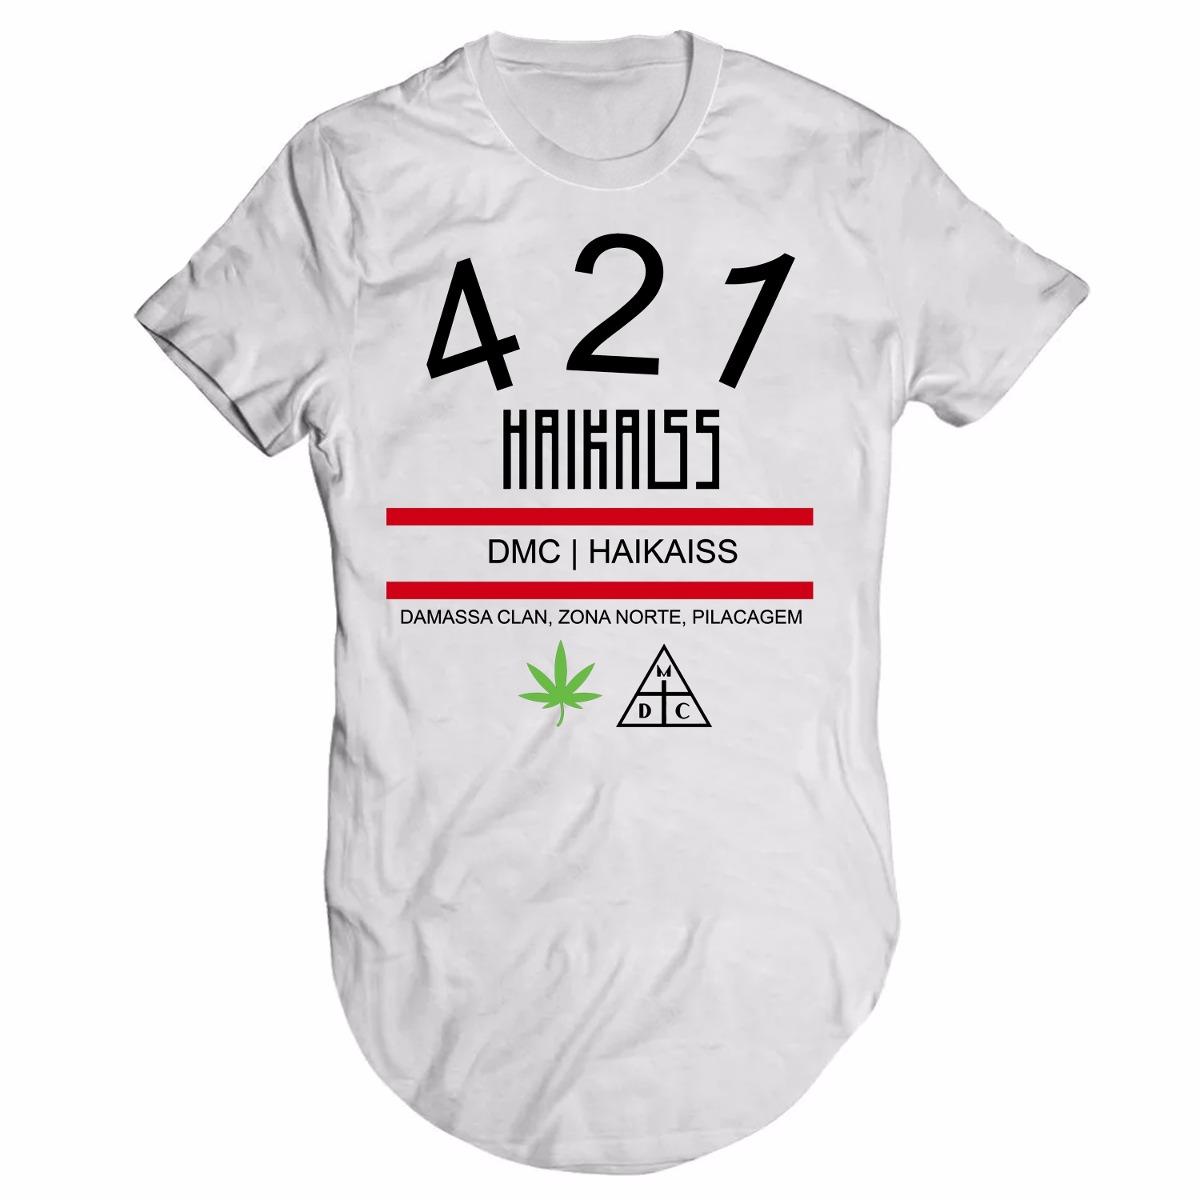 camiseta damassaclan haikaiss rap dmc longline. Carregando zoom. 14f70e47fe1